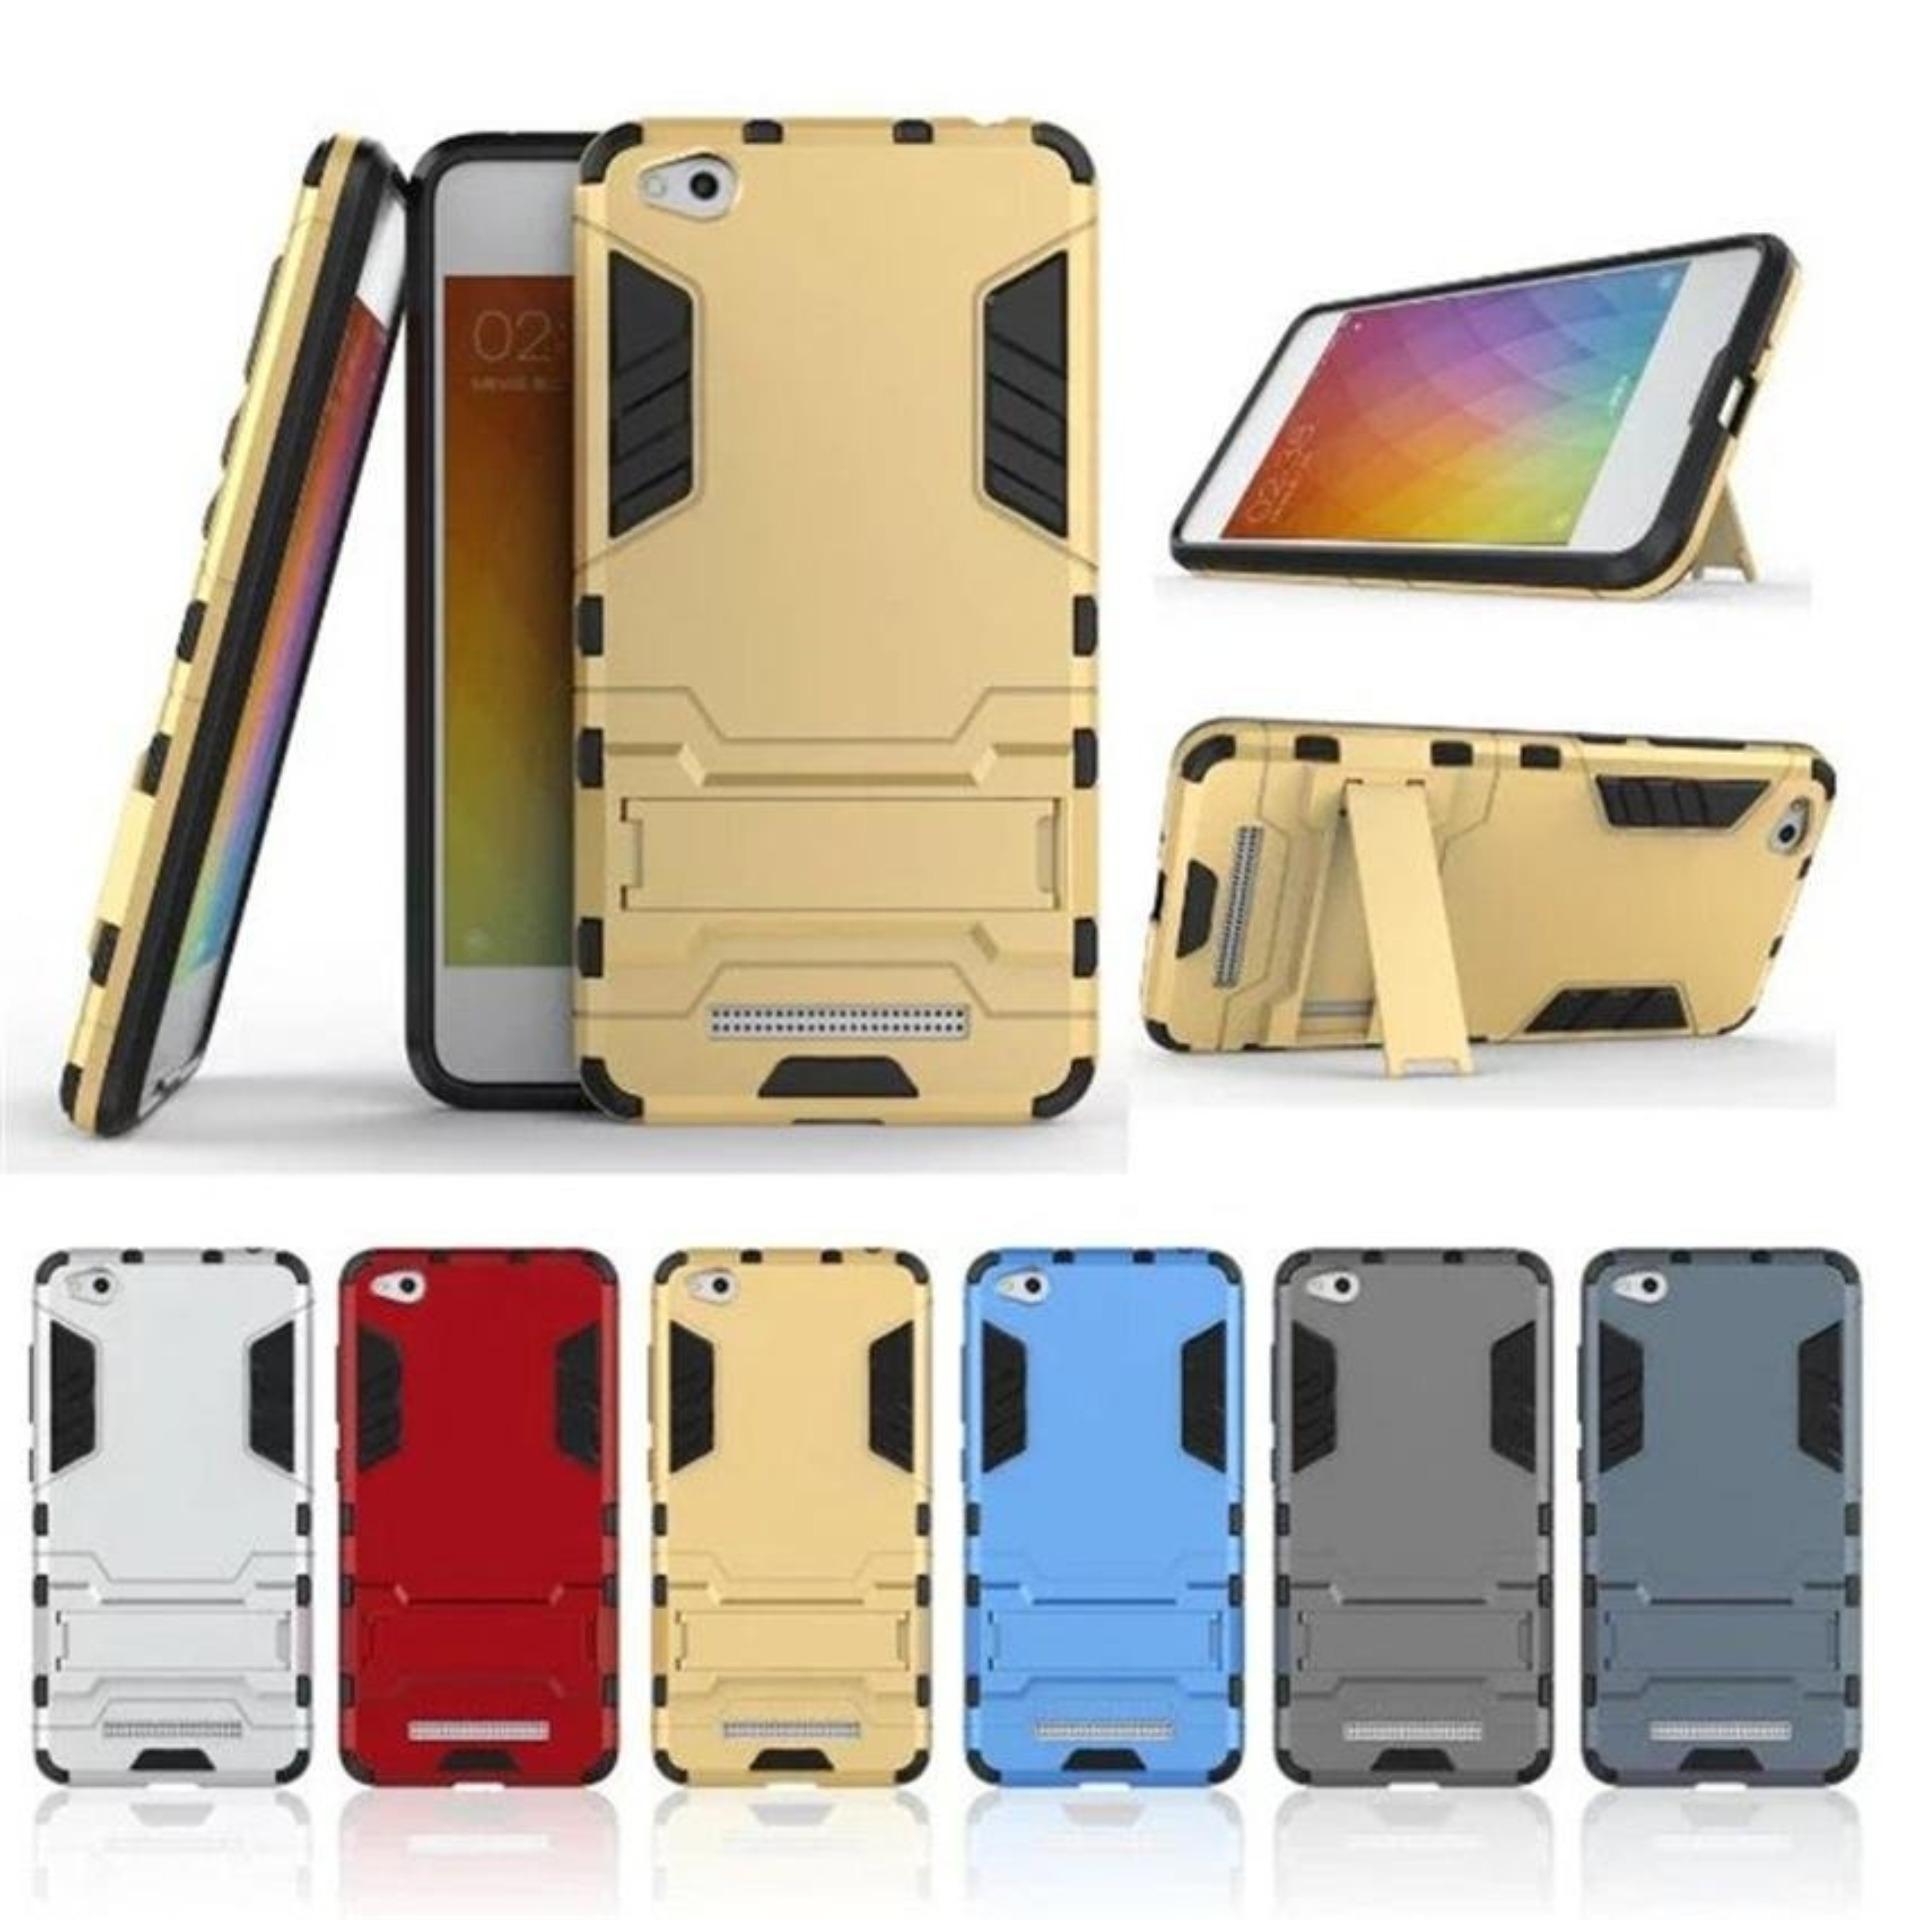 ... Case Iron Man for Xiaomi Redmi 4A Robot Transformer Ironman Limited Gold